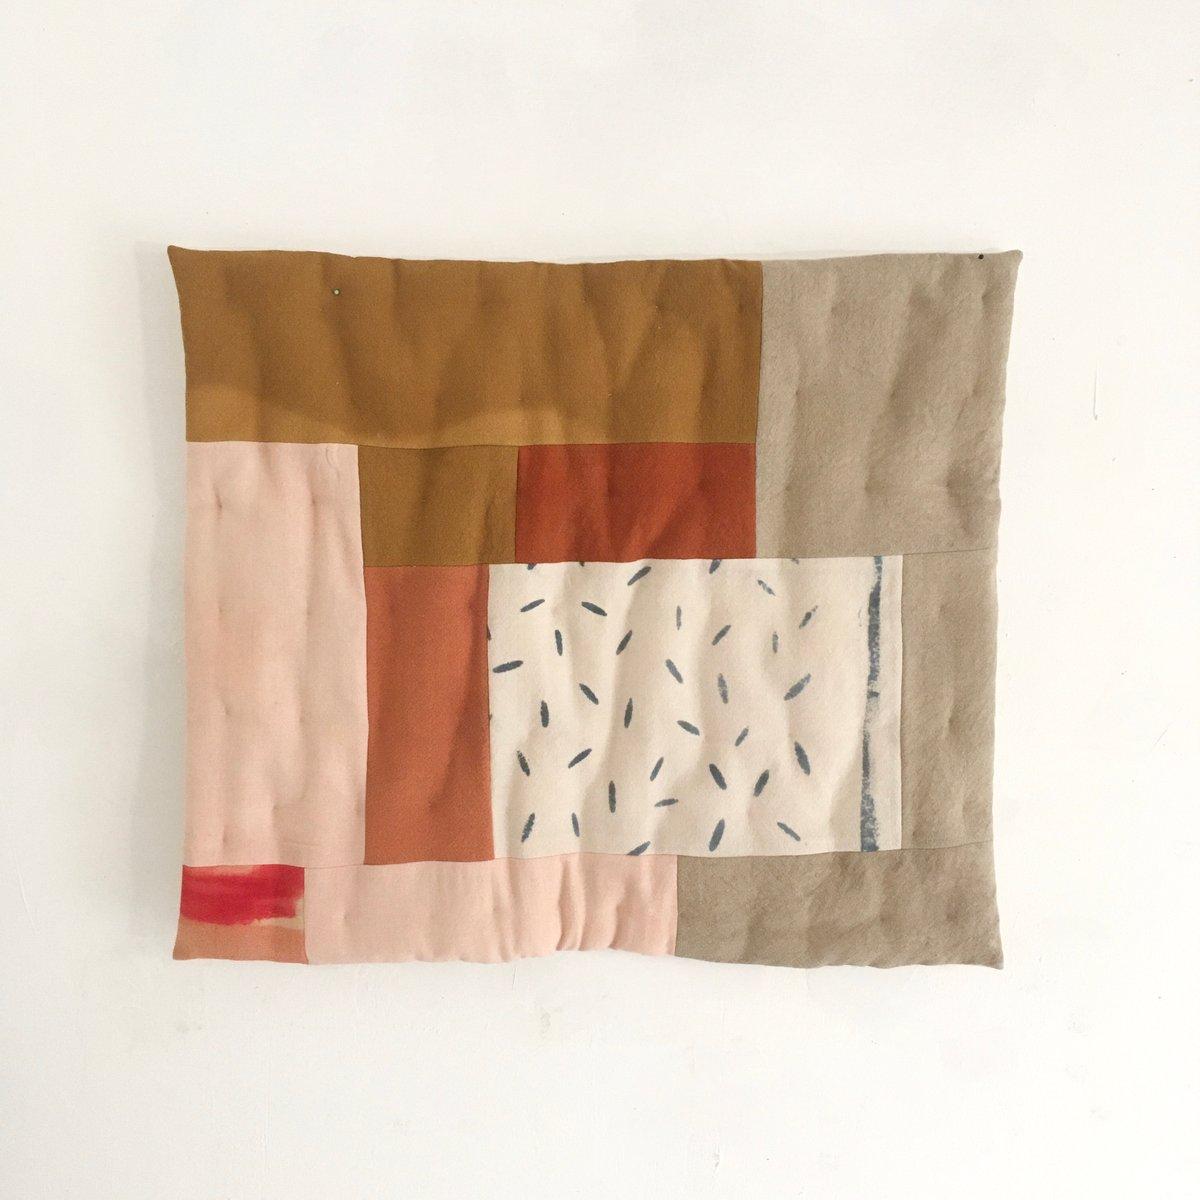 Image of rug 1